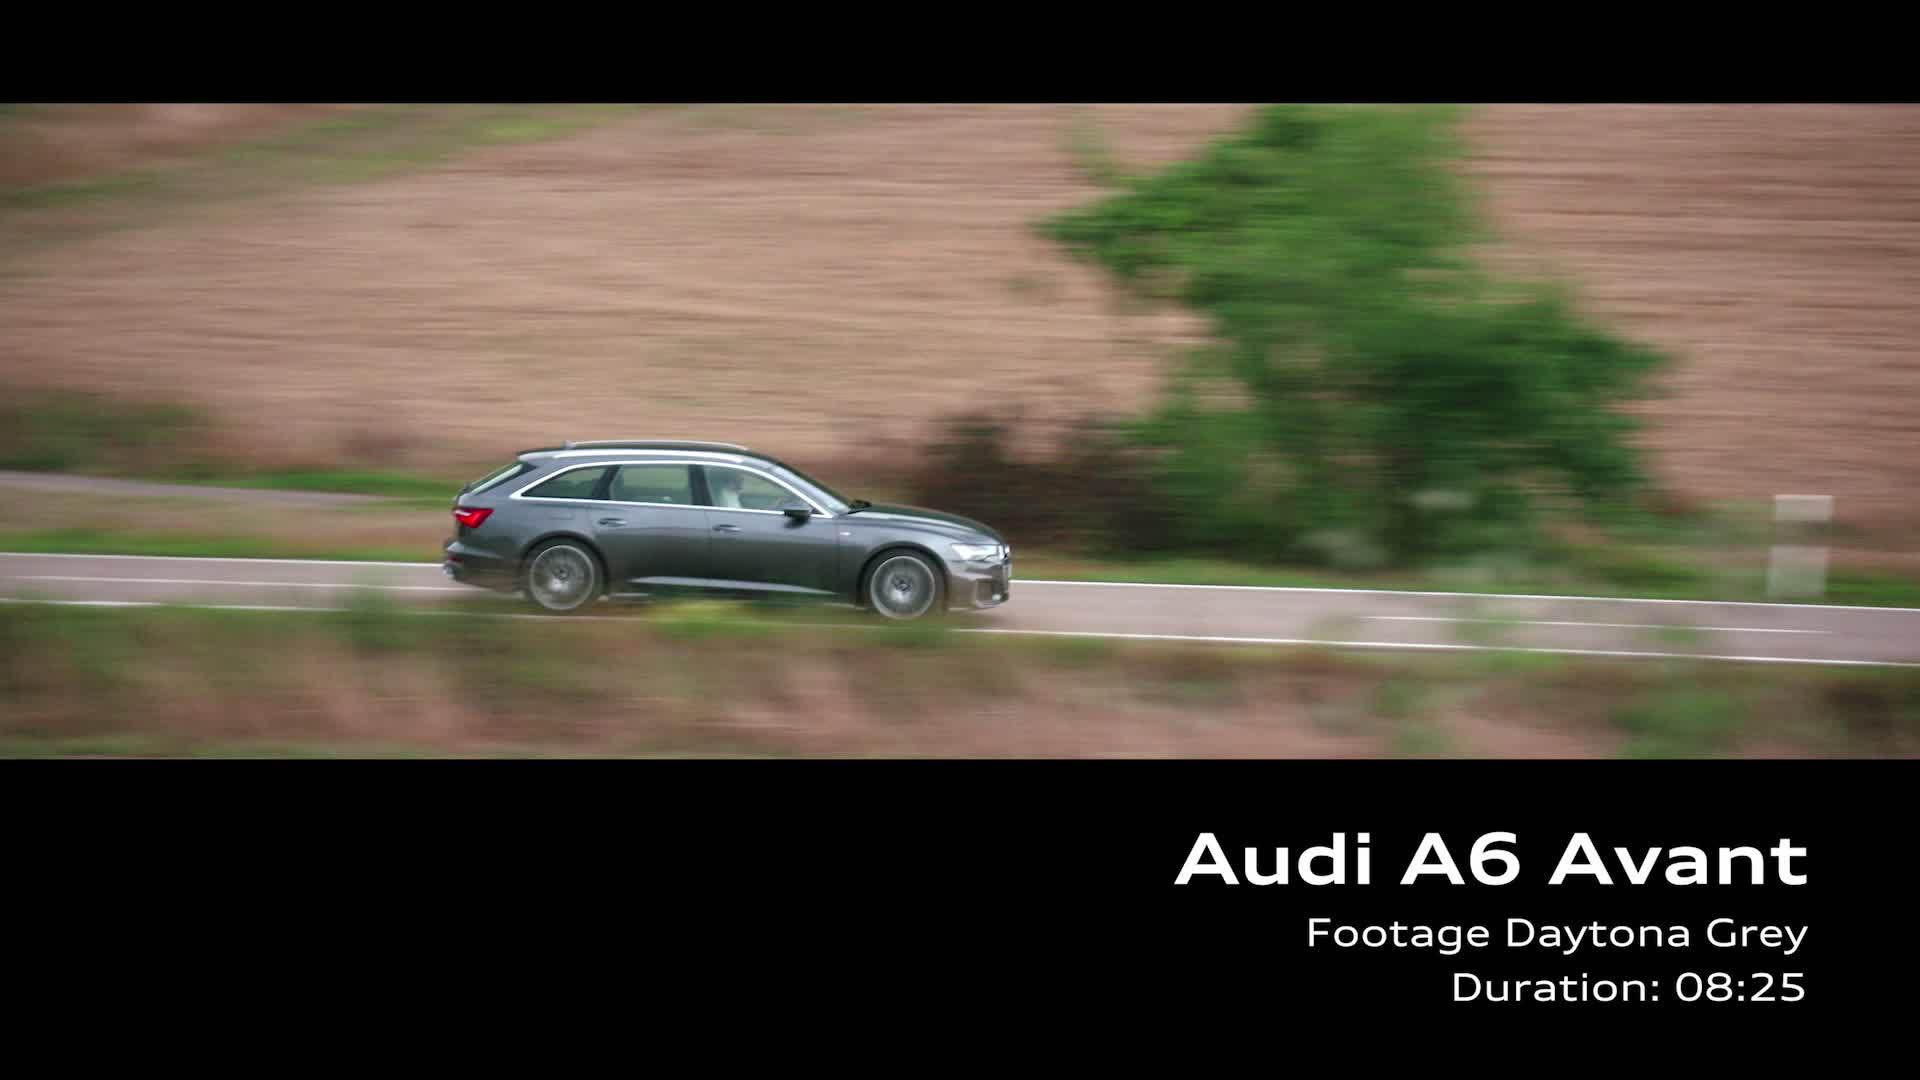 Audi A6 Avant On Location Footage Daytona Grey Video Audi Mediatv